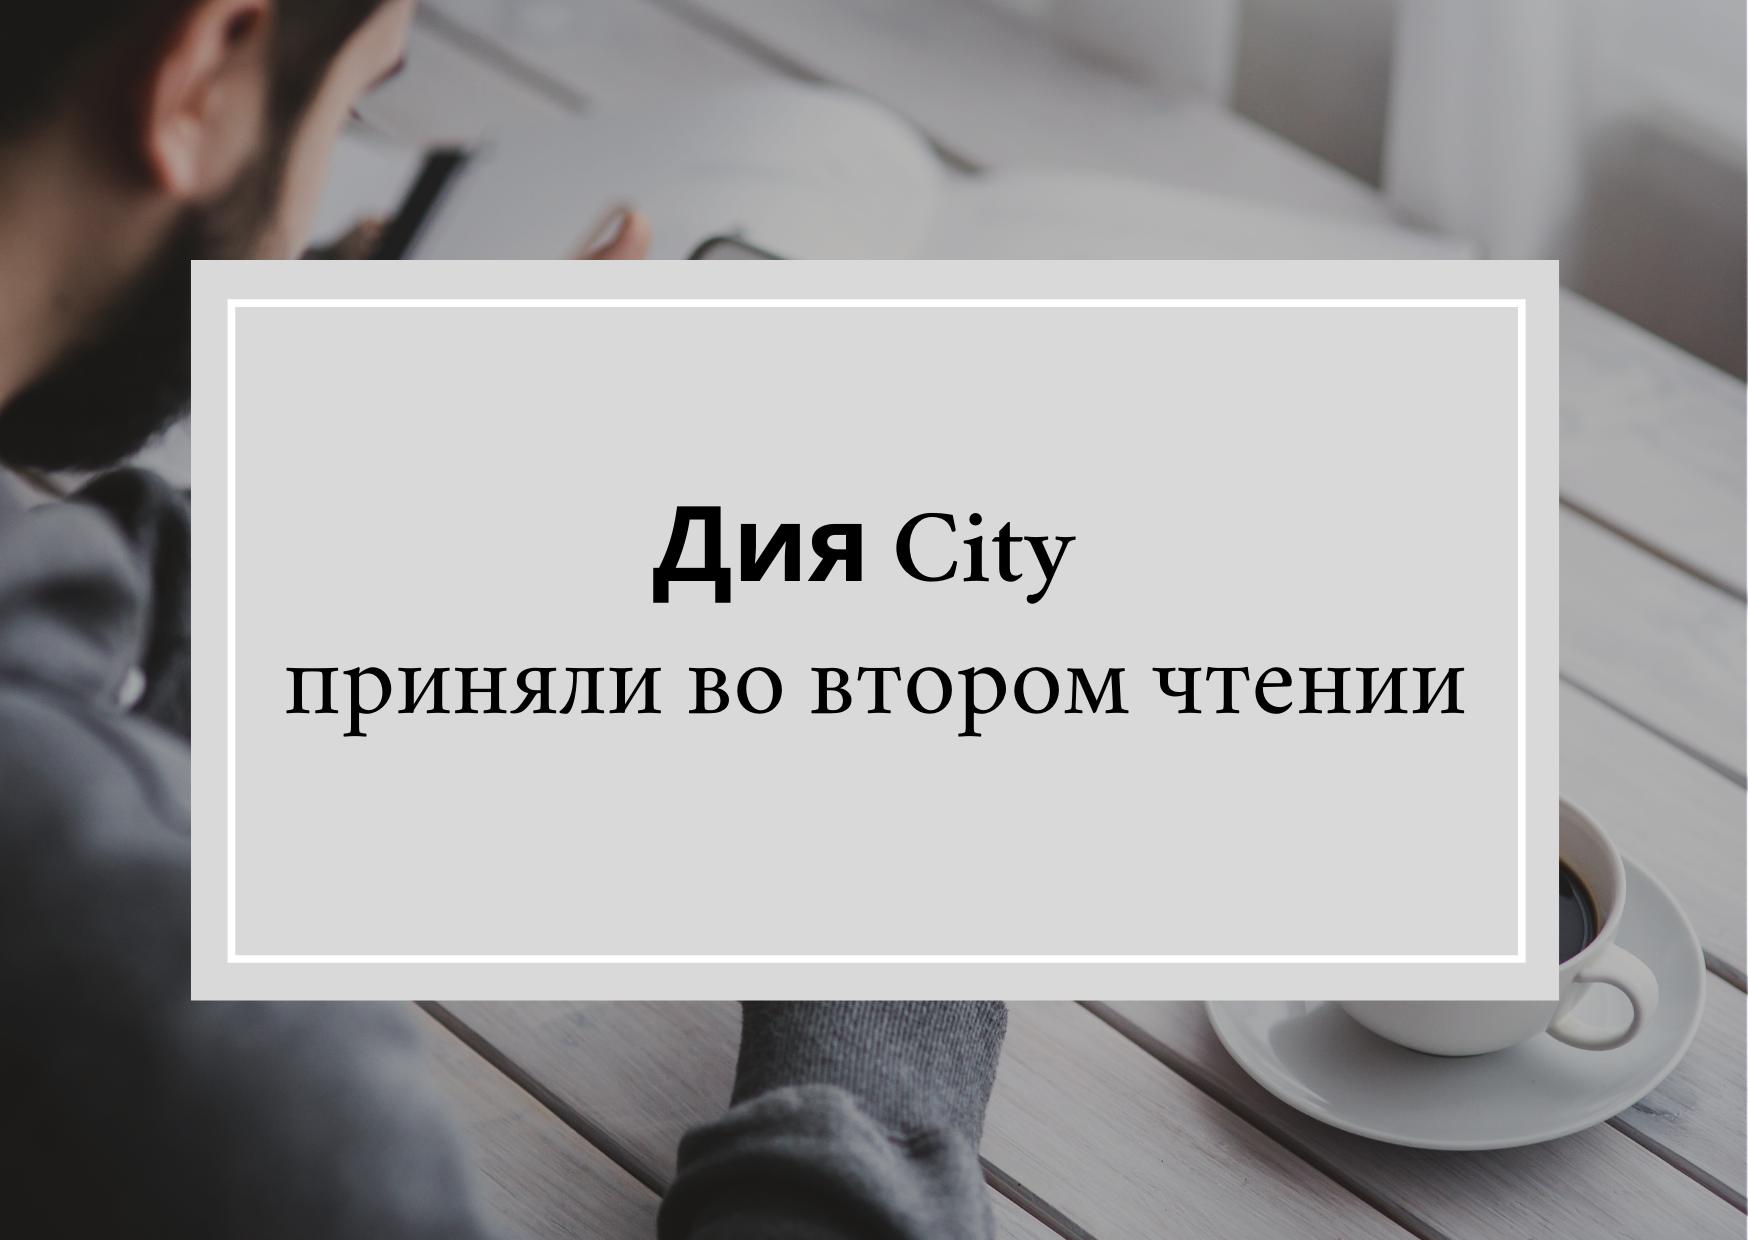 Законопроект Дия City